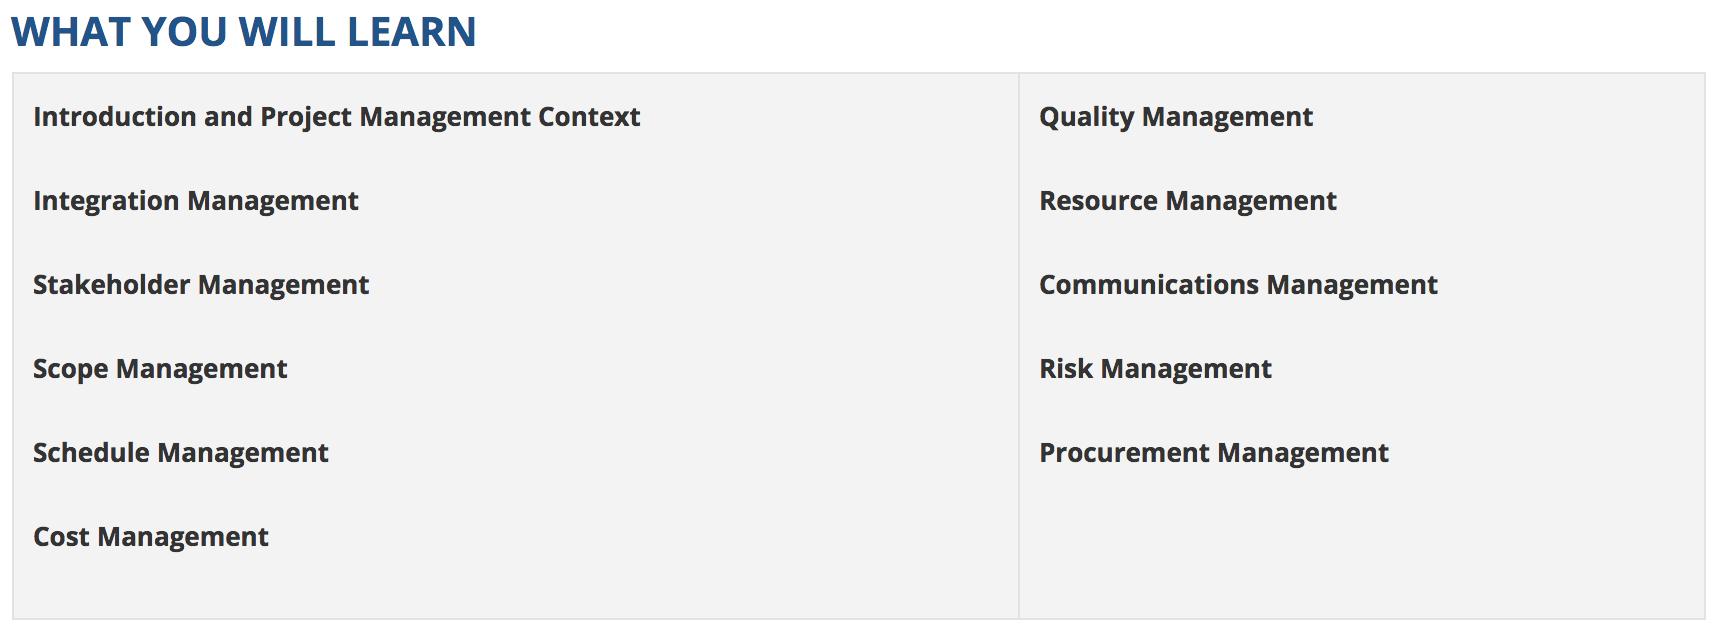 Laurentian University Goodman School Of Mines Project Management